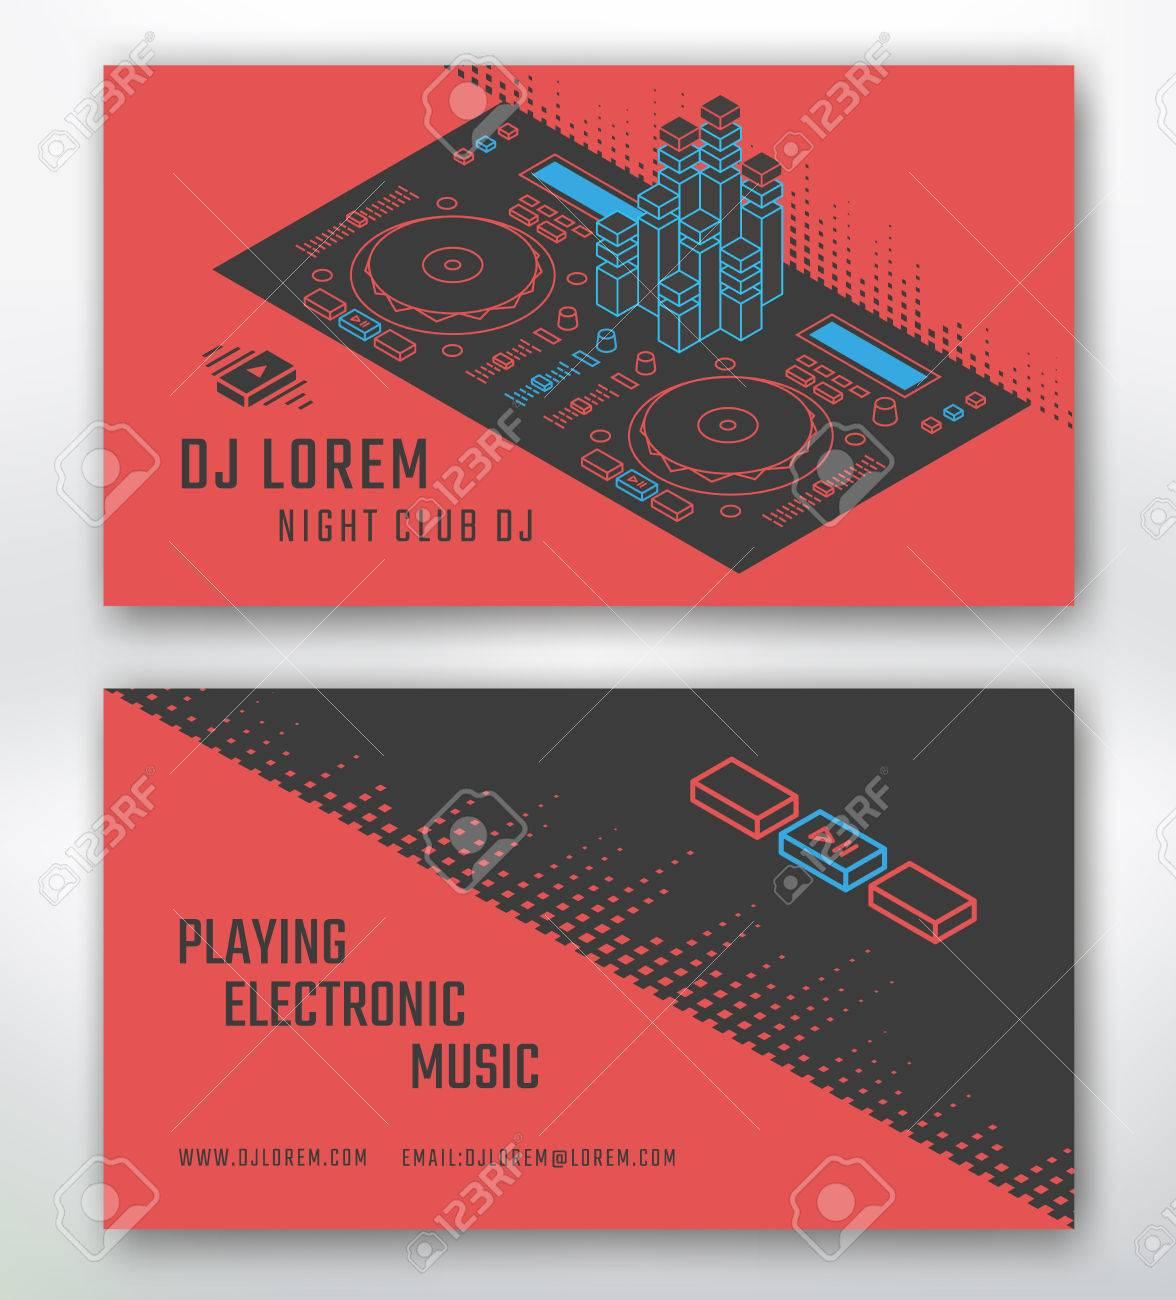 Visitenkarte Fur Dj Oder Musikstudio Nachtclub Standard Bild